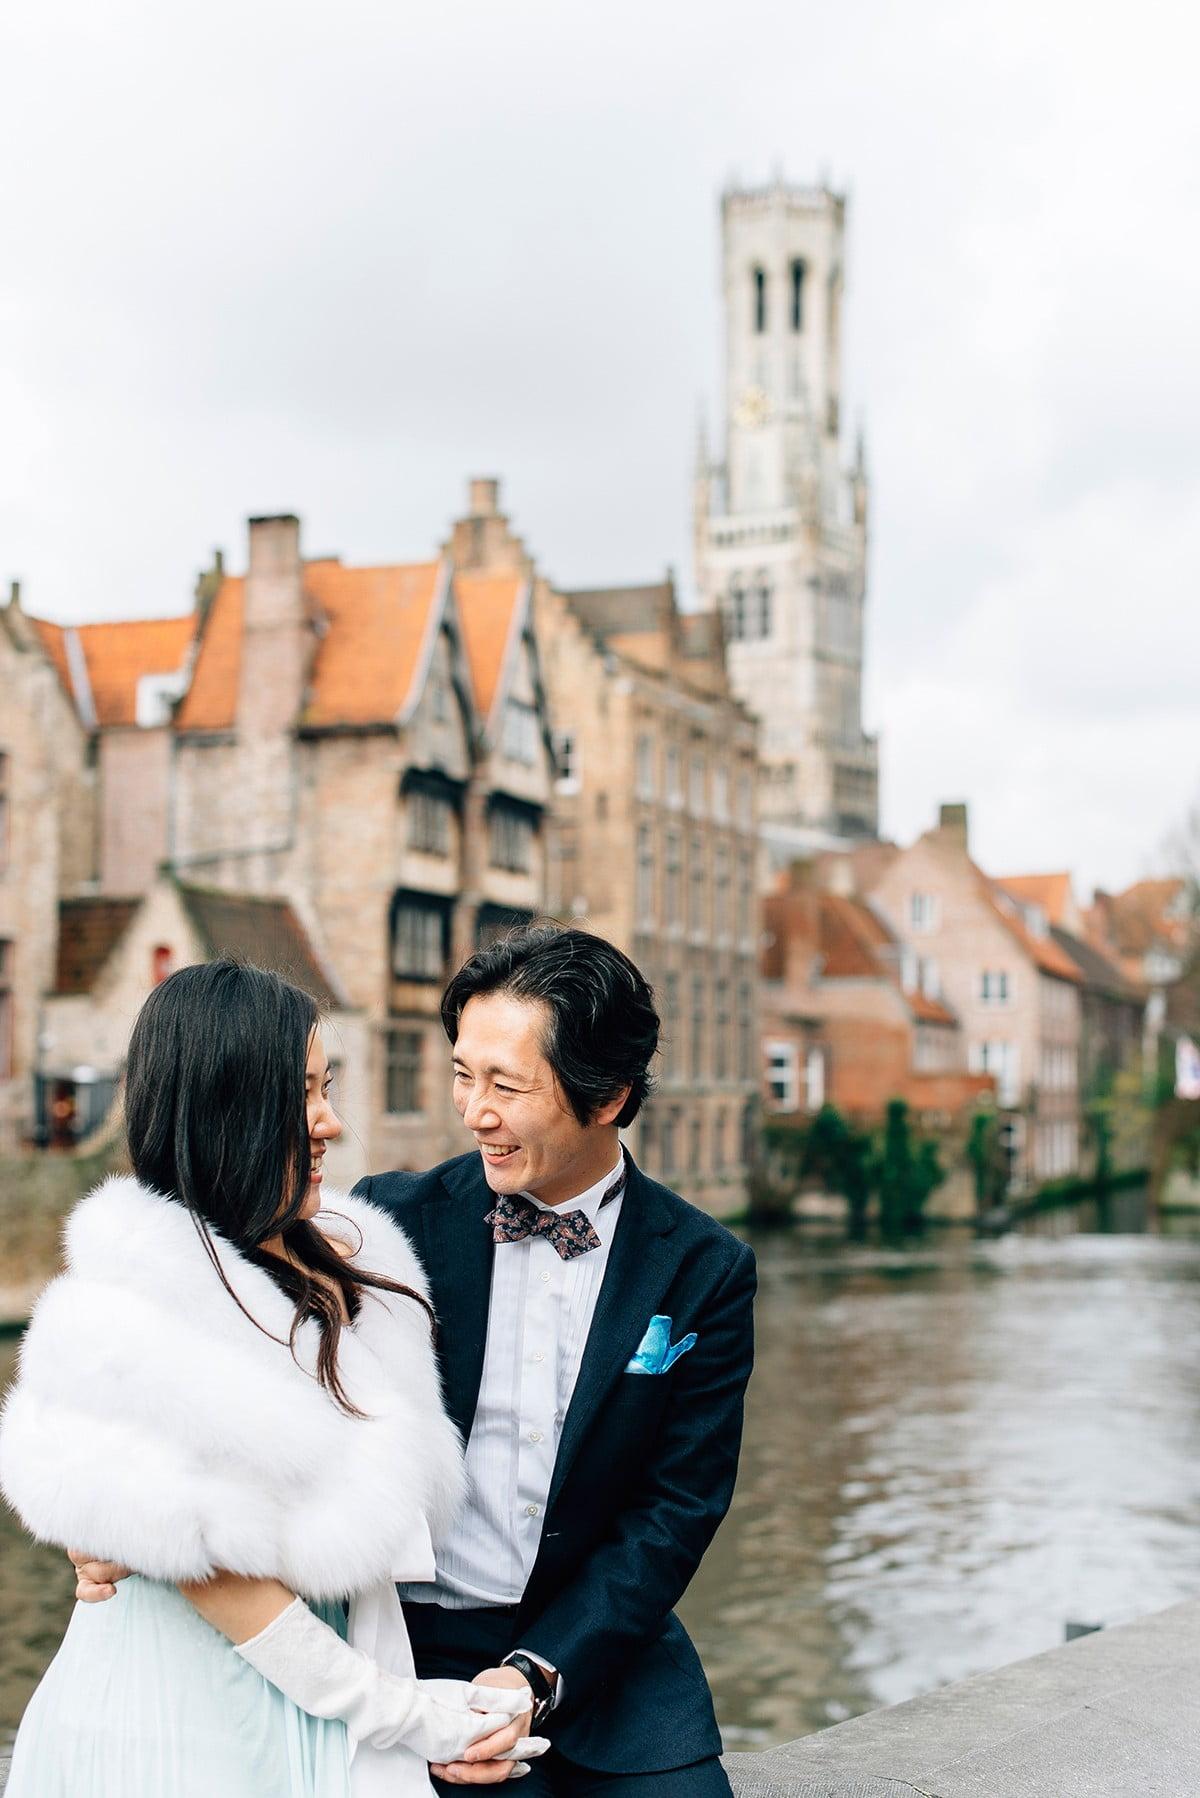 Brugge-Love-Shoot-Kasia-Bacq-11